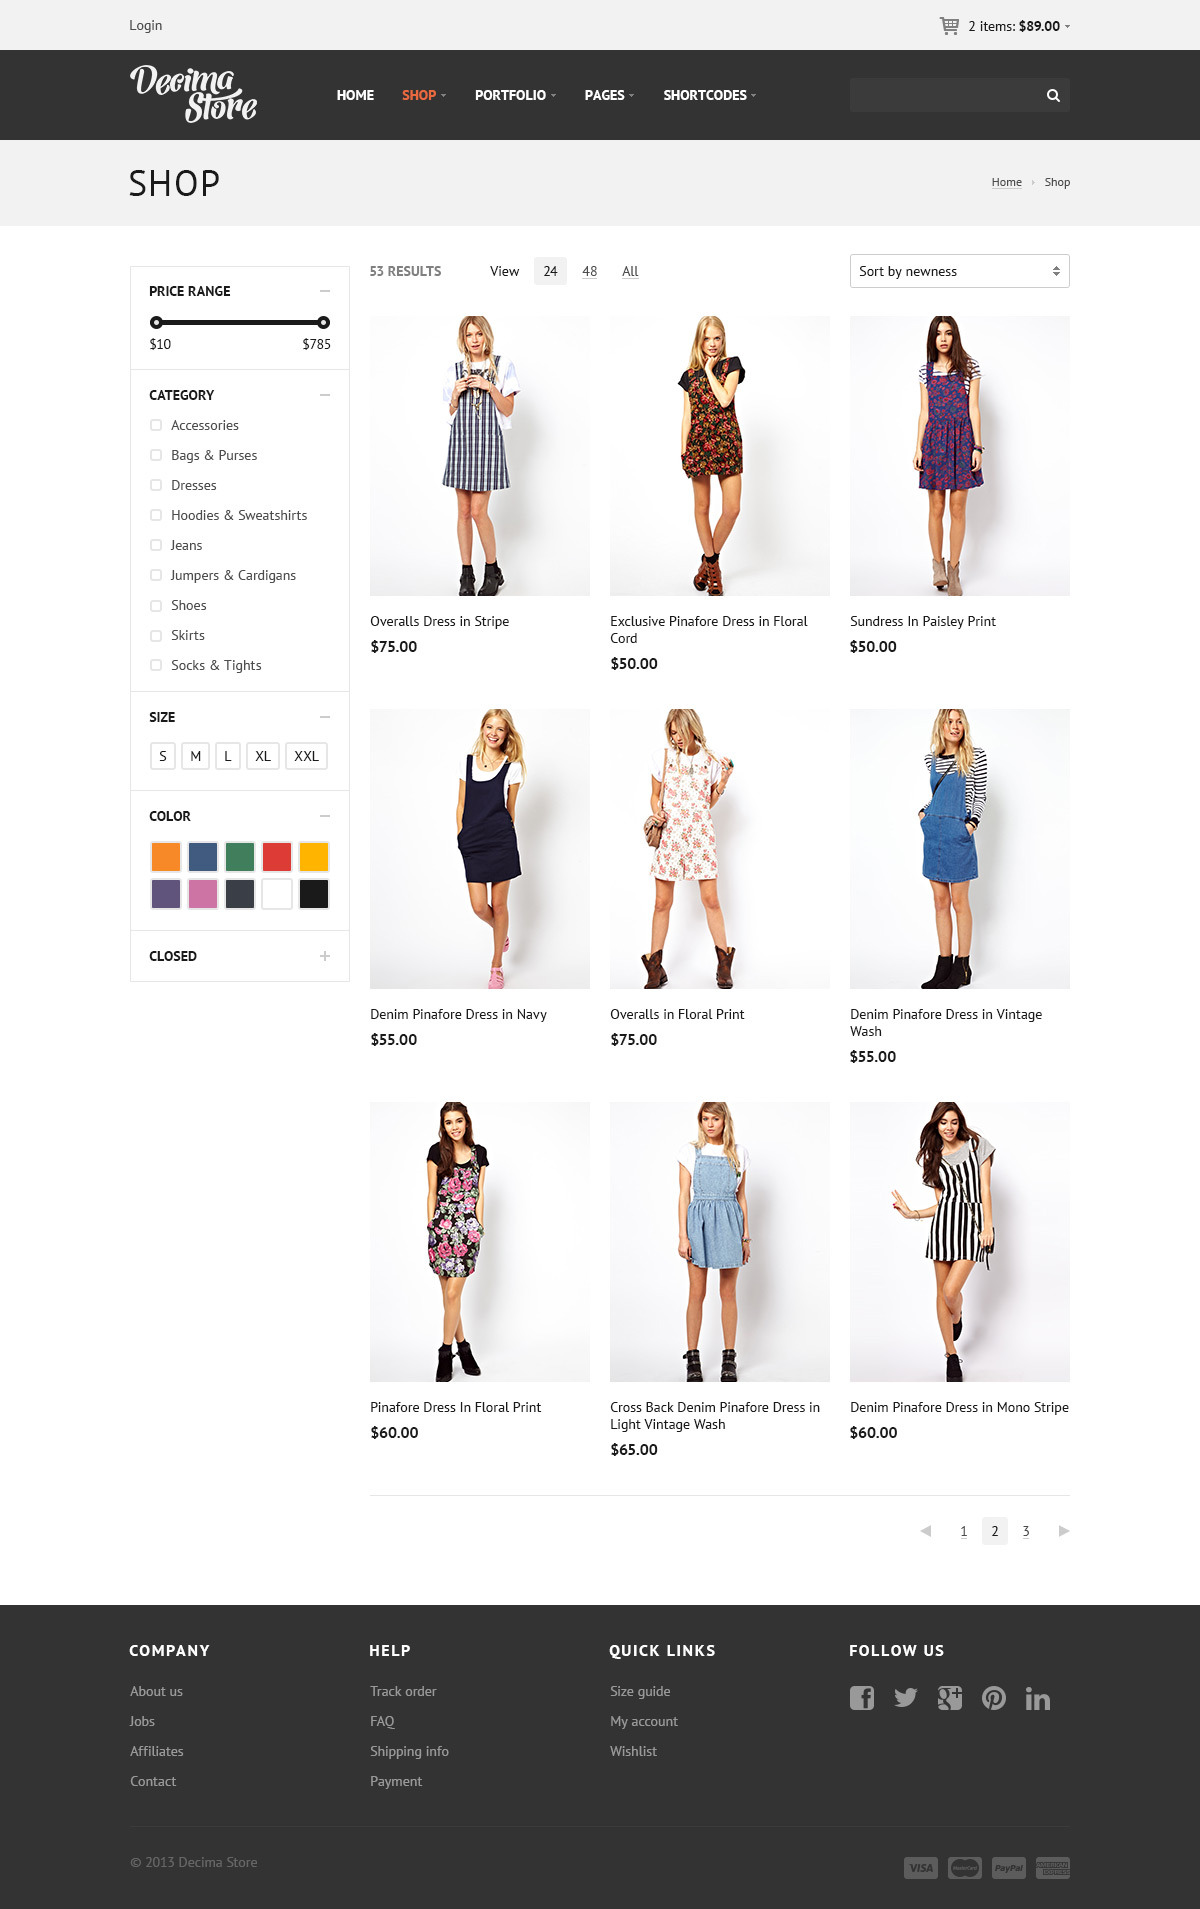 Decima eCommerce HTML Template by ThemeWoodmen   ThemeForest